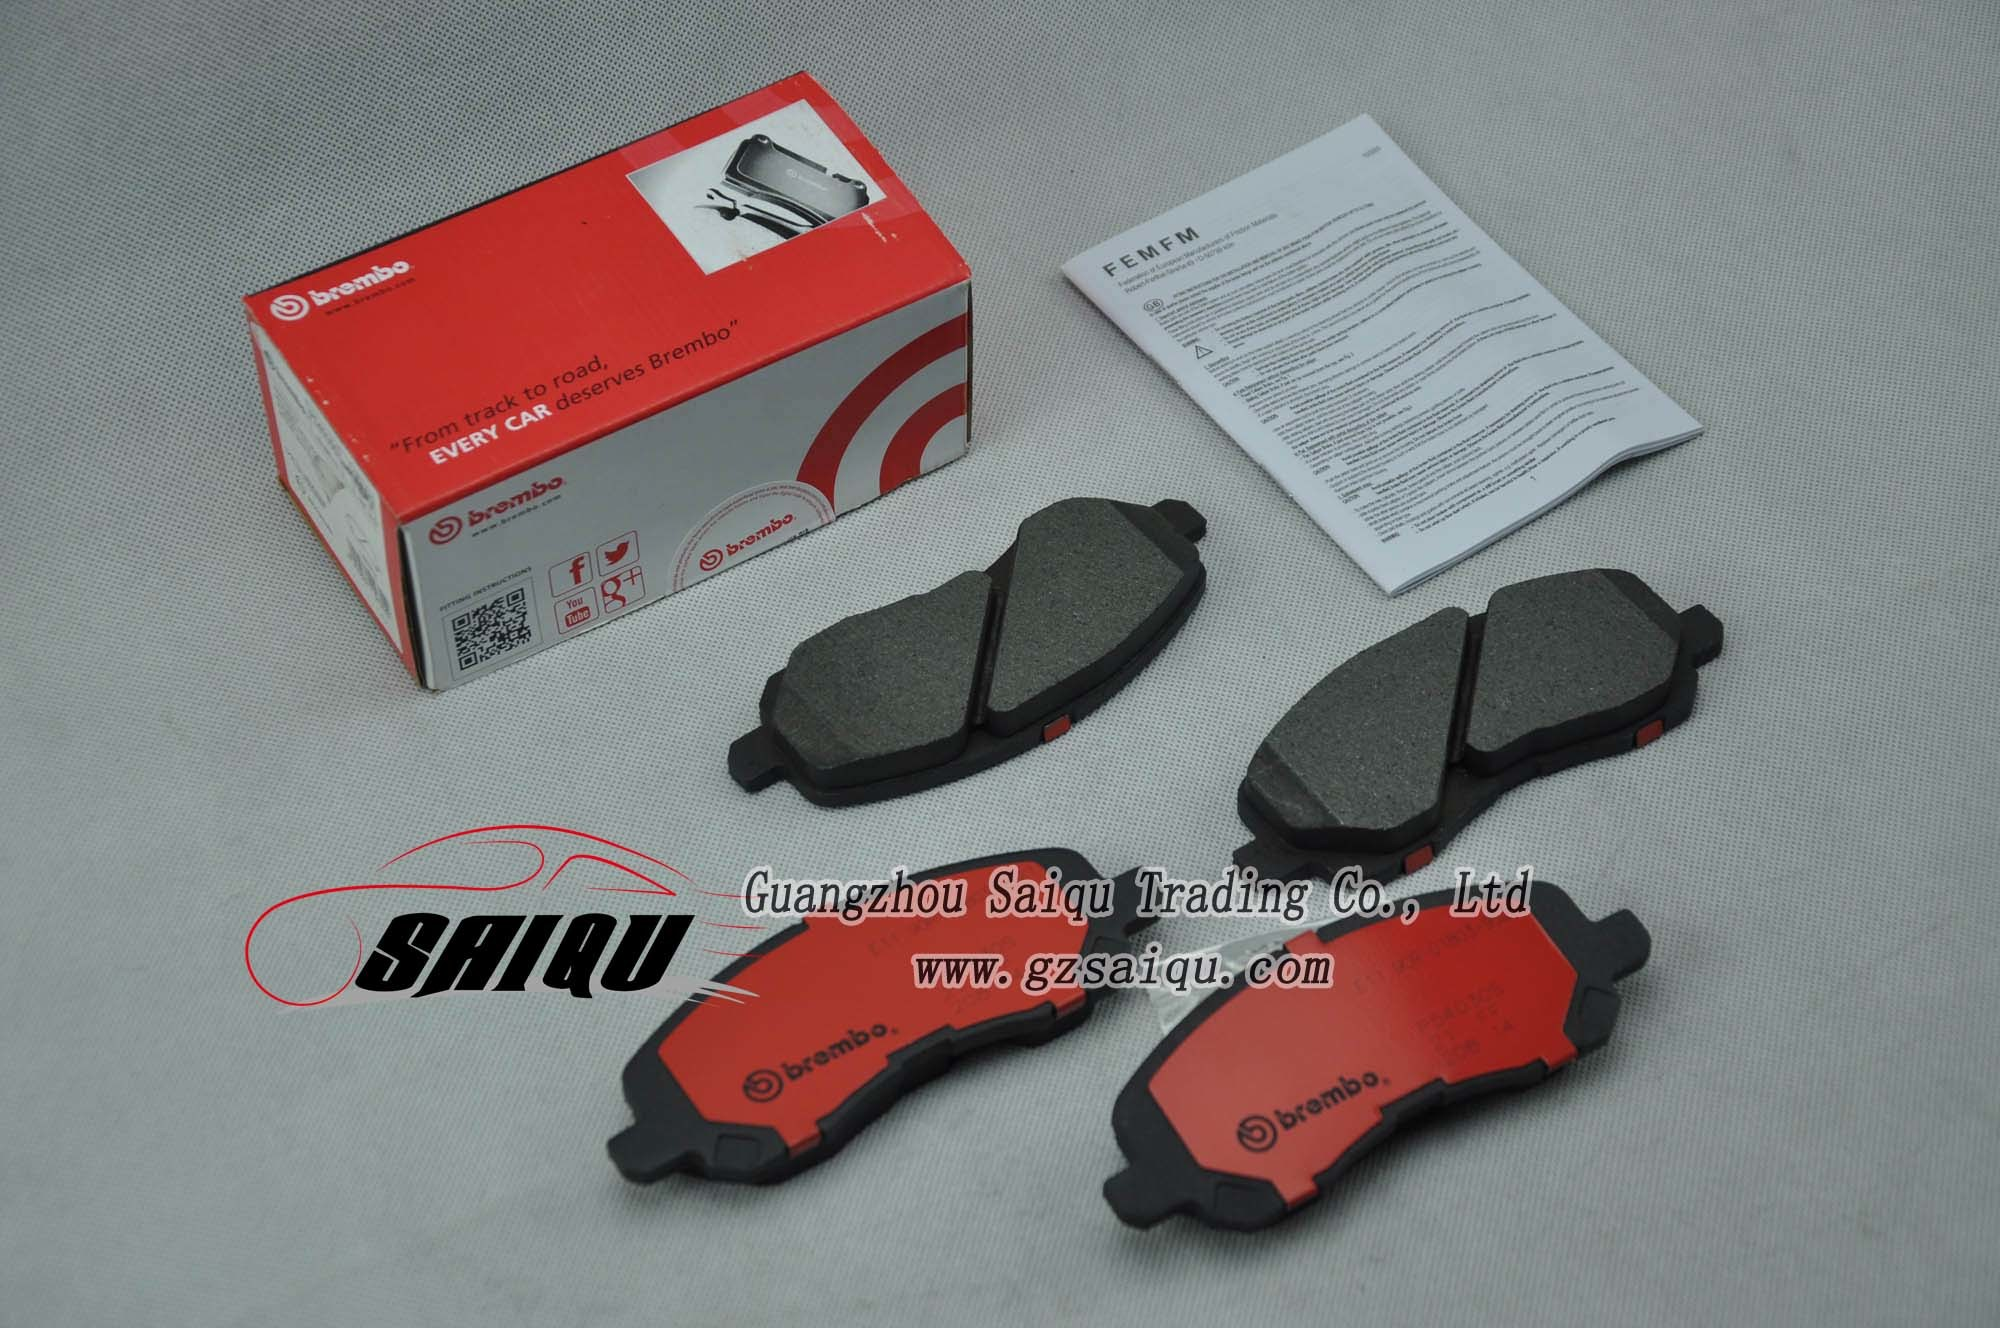 Brembo Brake Pads >> China Original Oem Brembo Brake Pads For Lancer Ex China Car